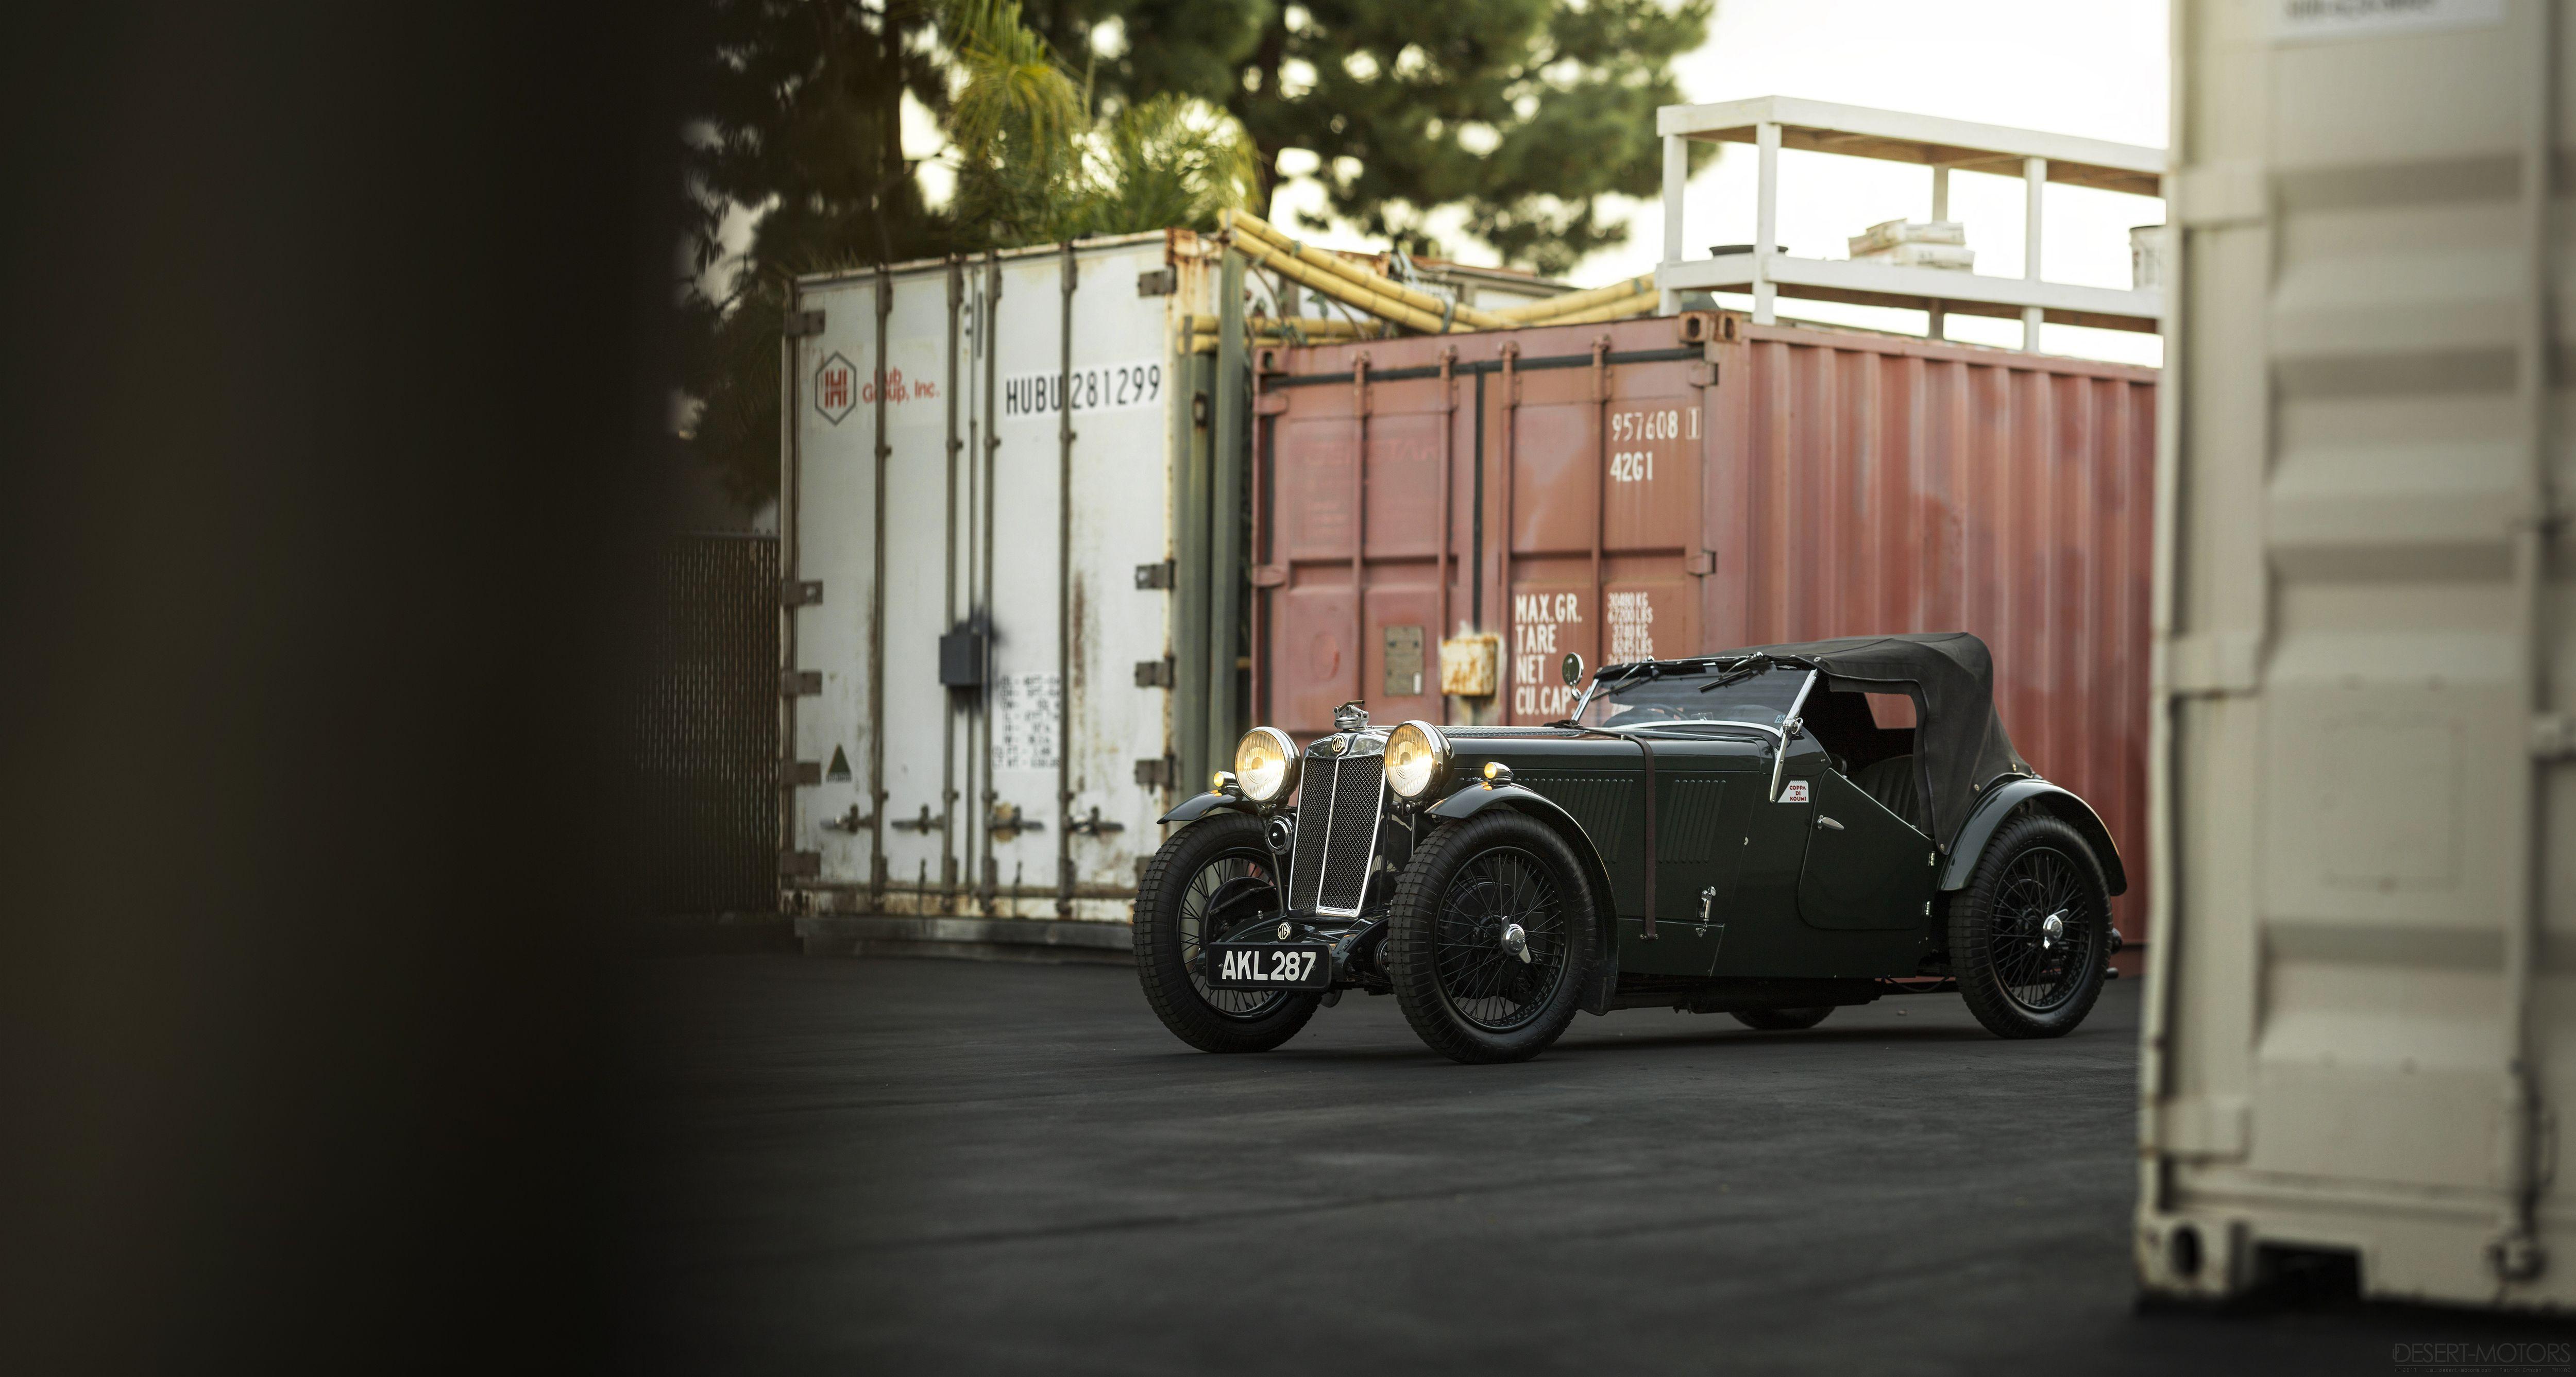 Old Cars Car Antique Cars